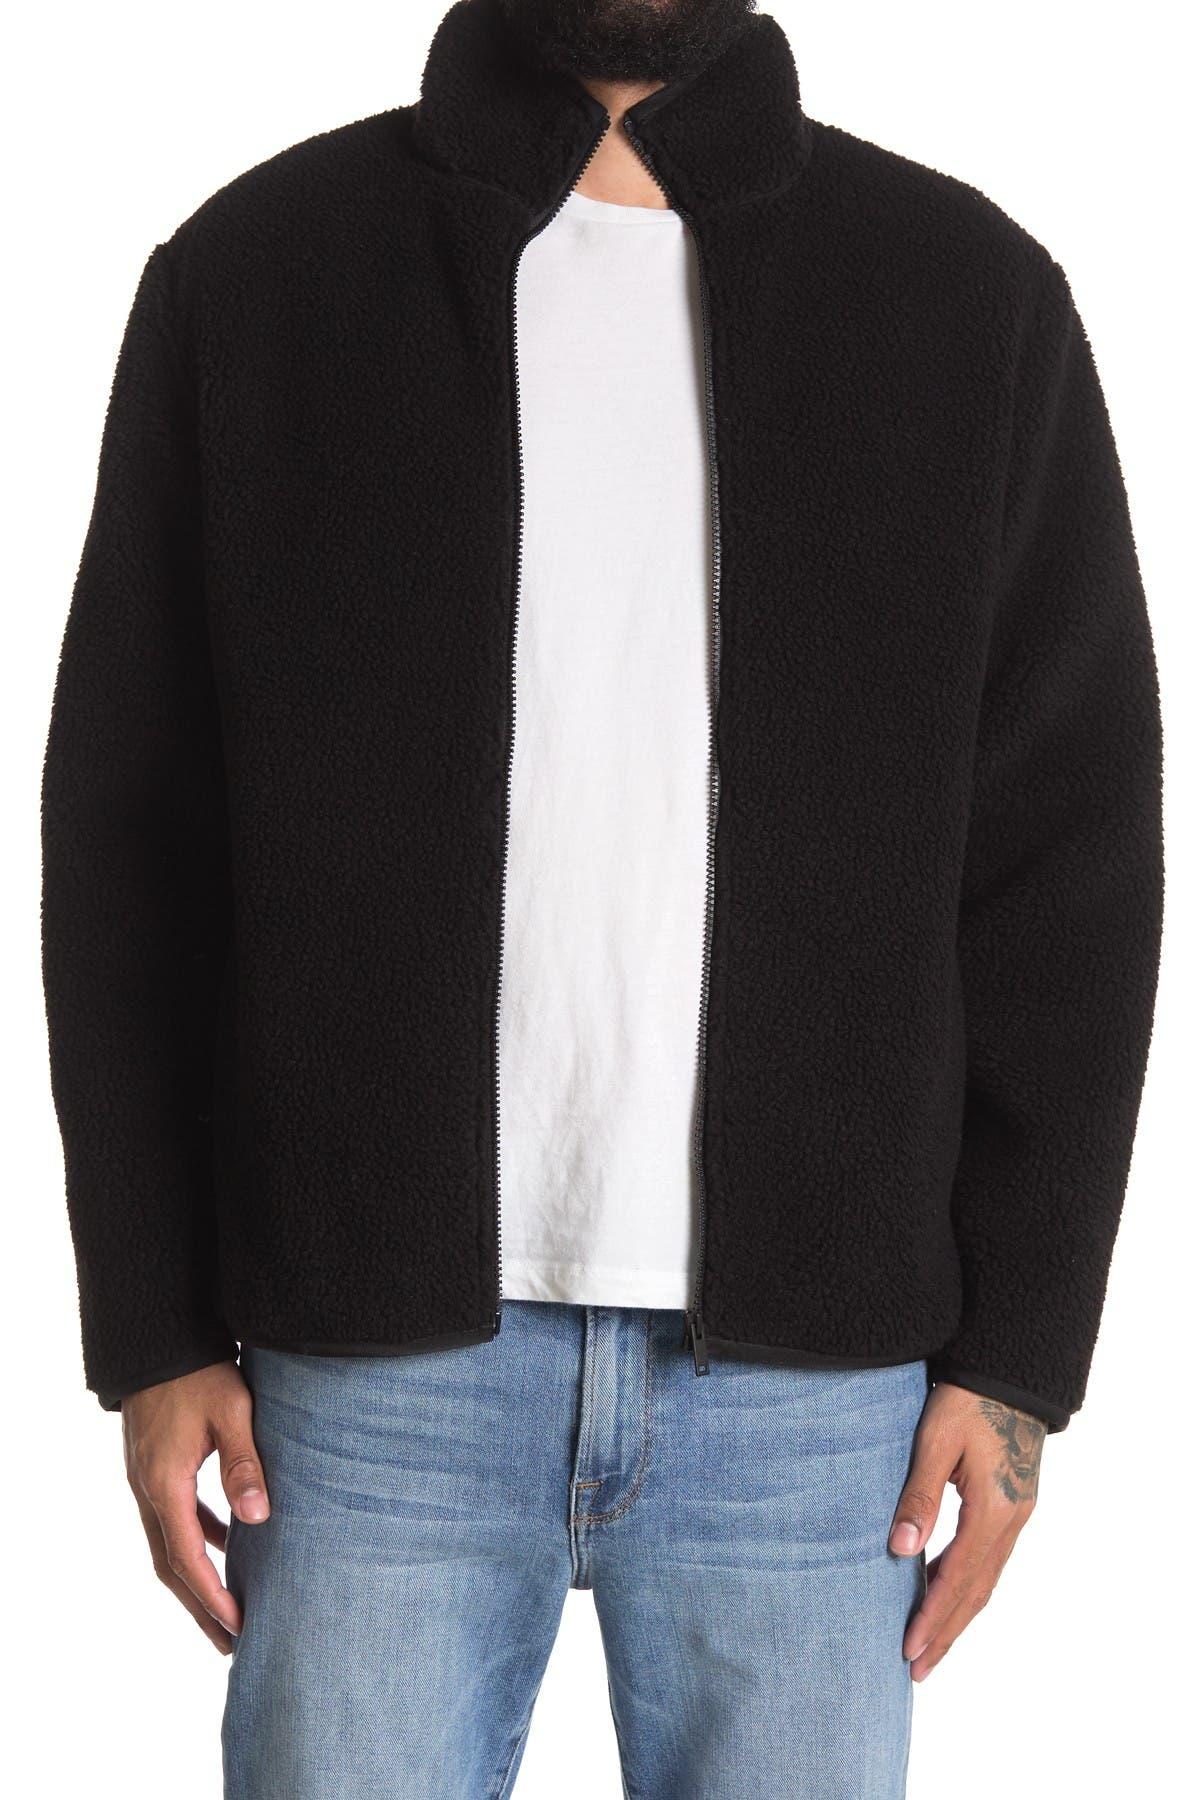 Image of Theory Classon F.Glacial Fleece Jacket